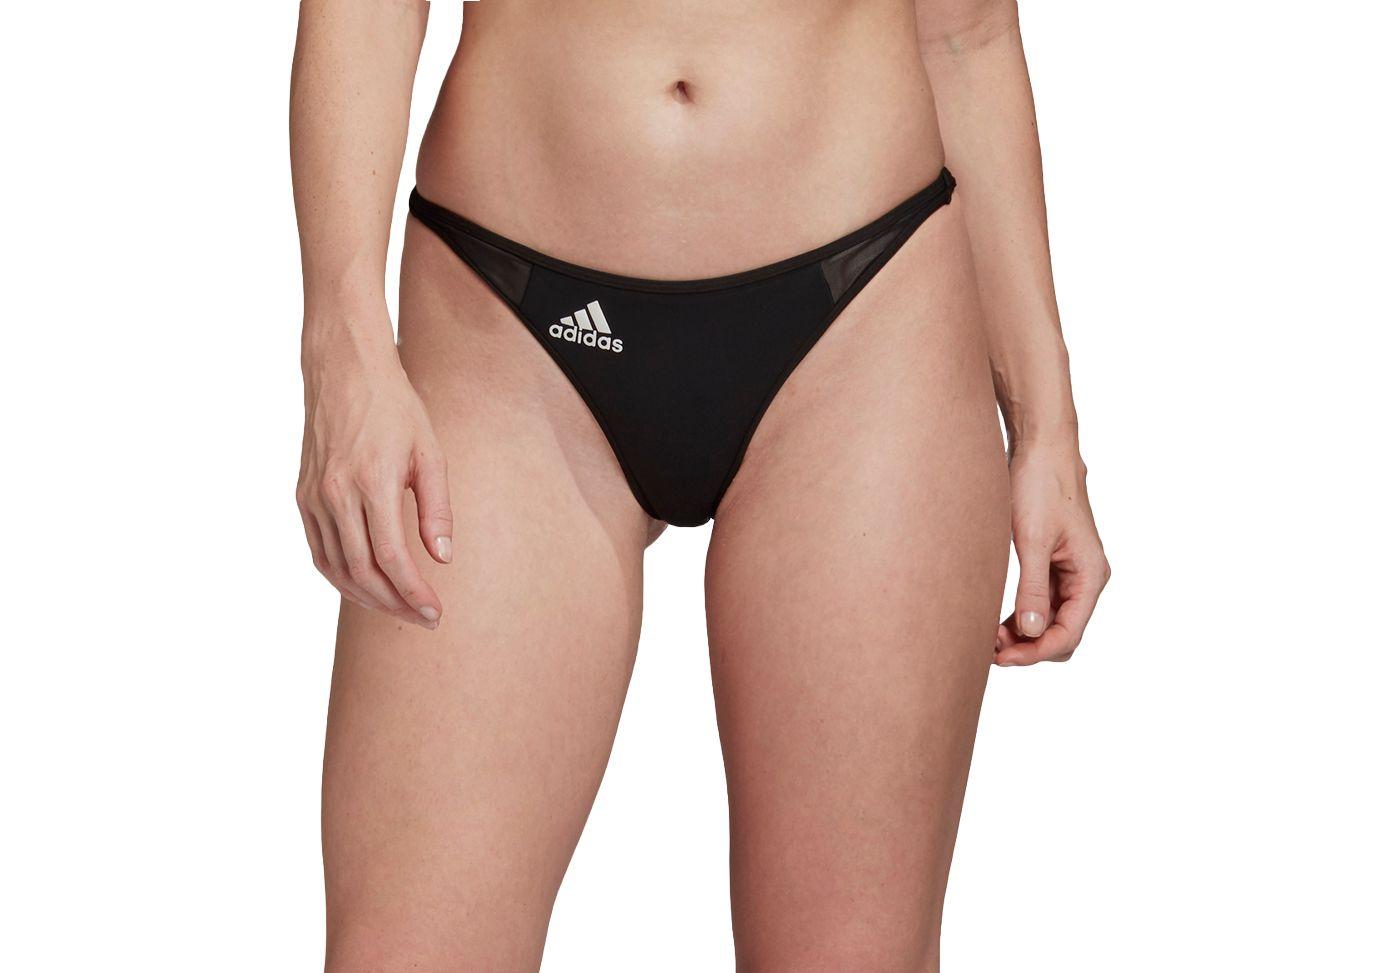 adidas Women's Sporty Bikini Bottoms